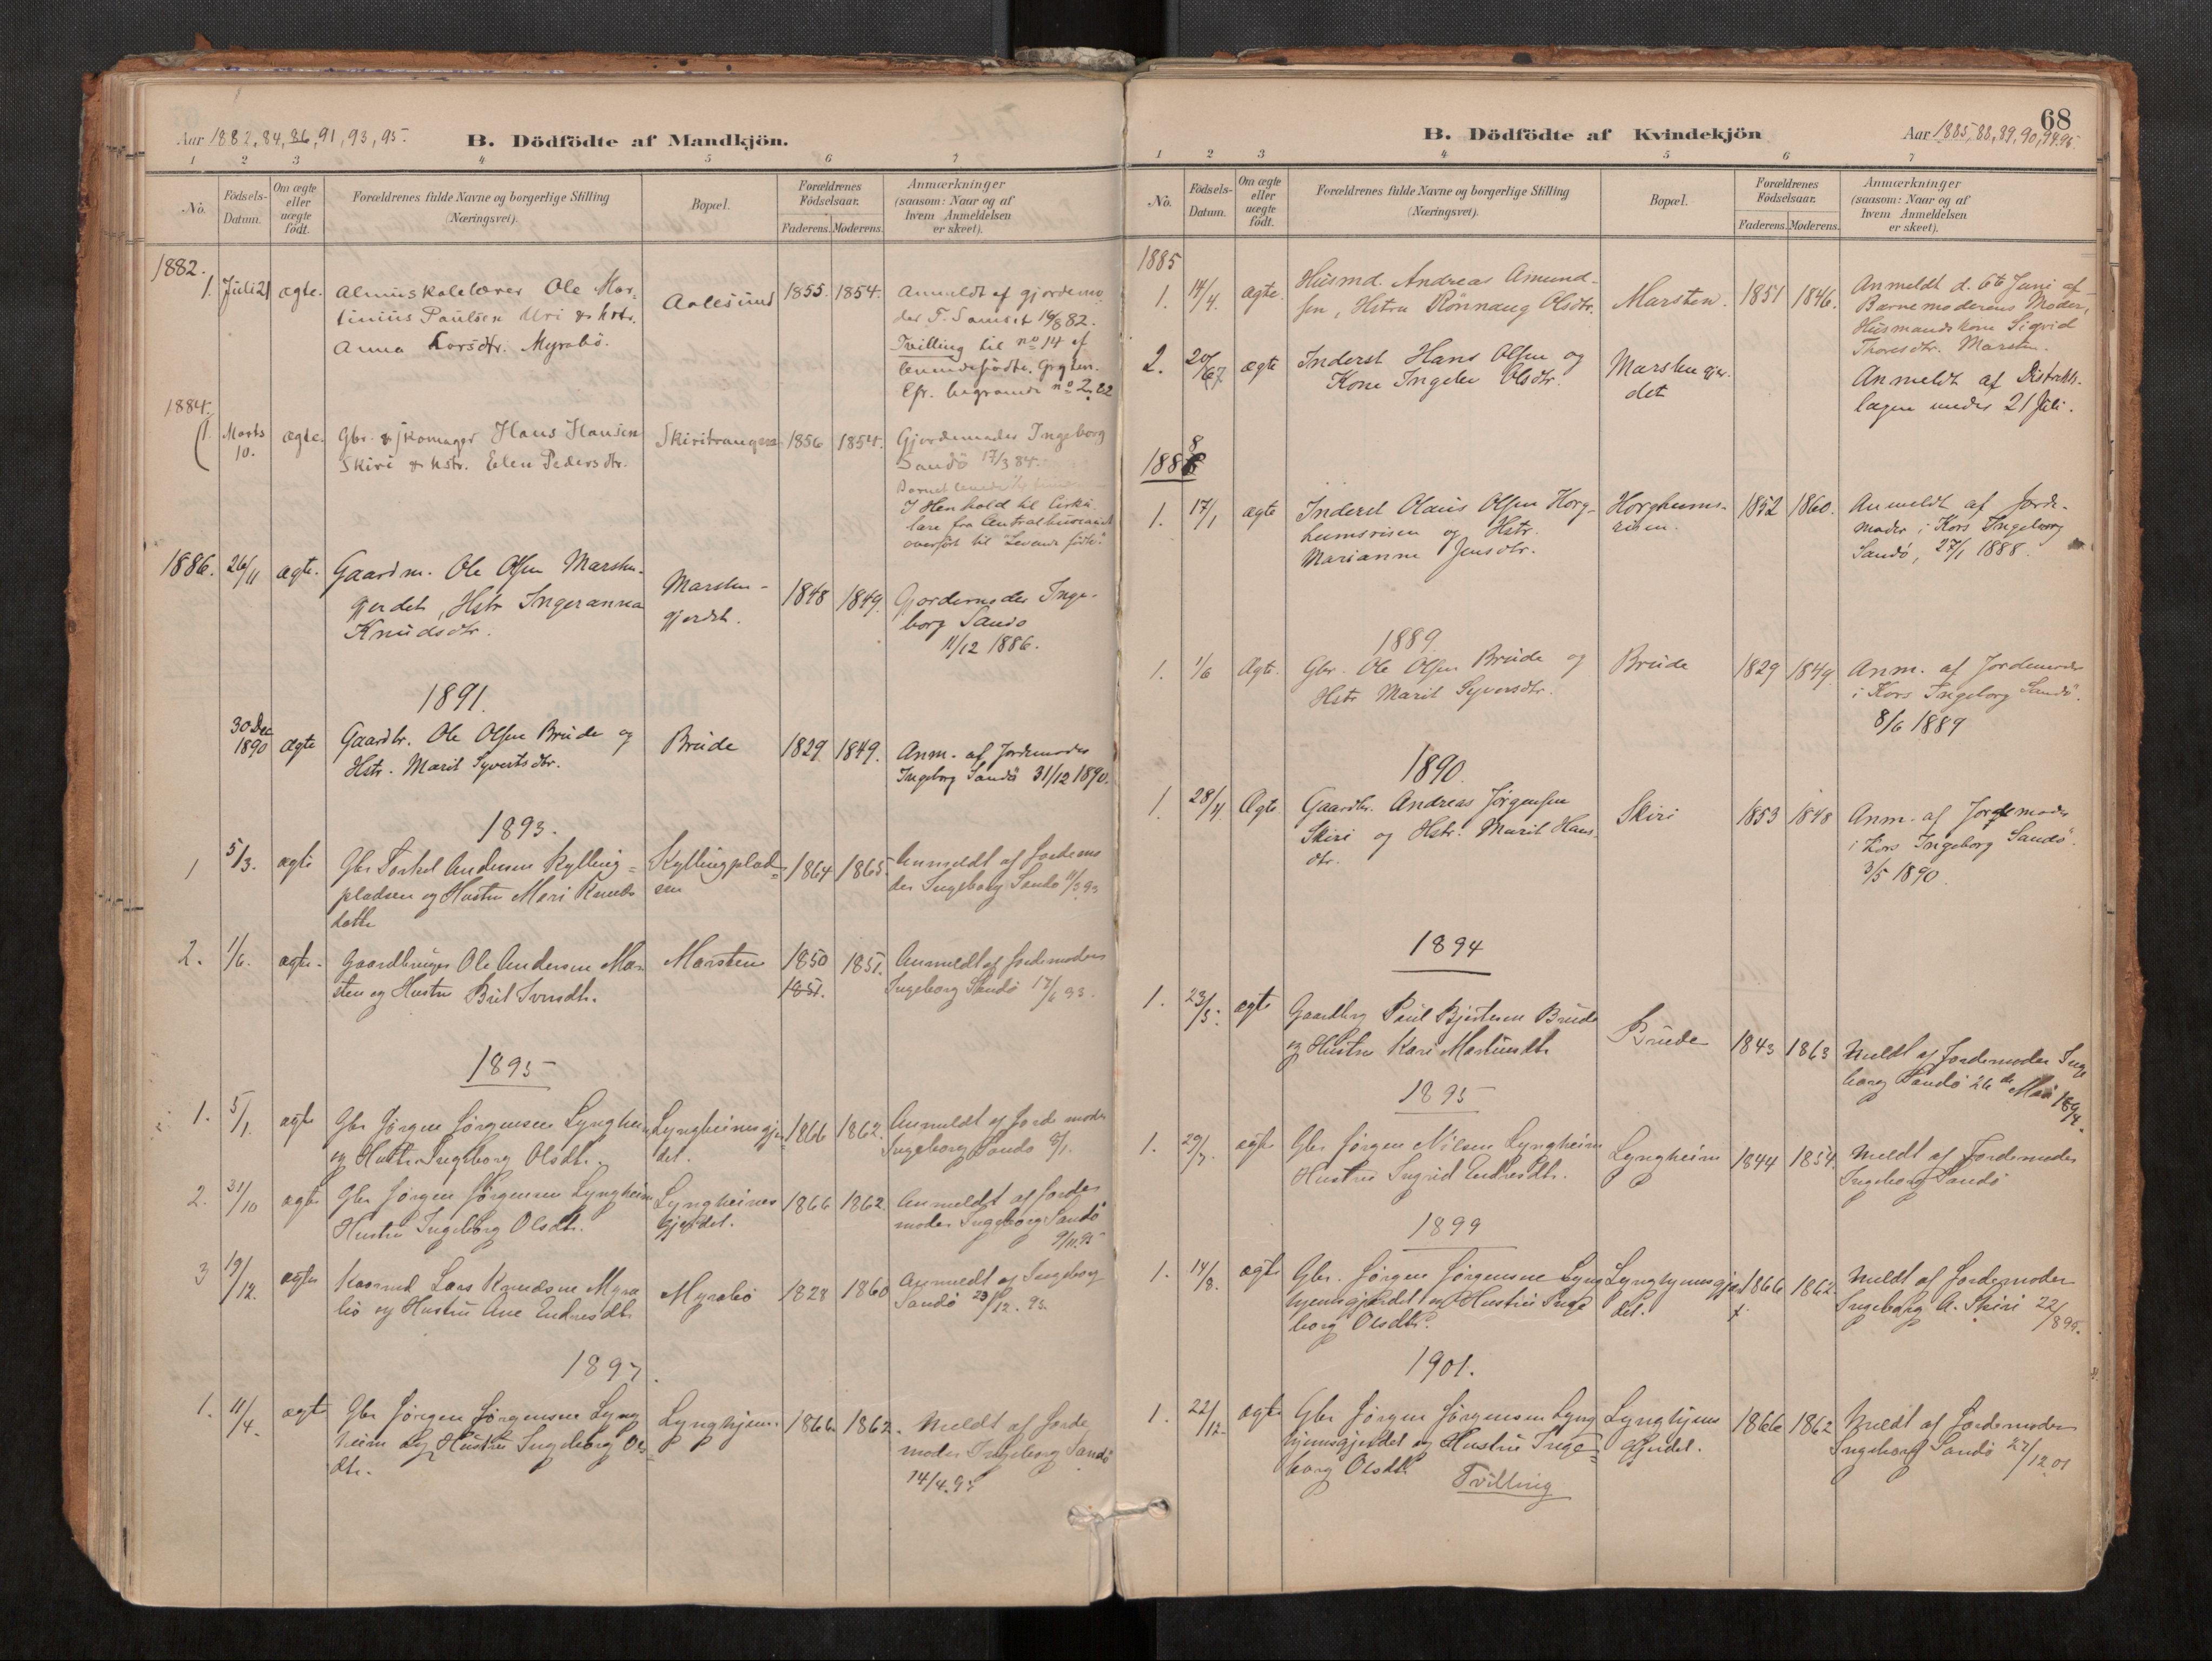 SAT, Grytten sokneprestkontor, Ministerialbok nr. 546A03, 1882-1920, s. 68